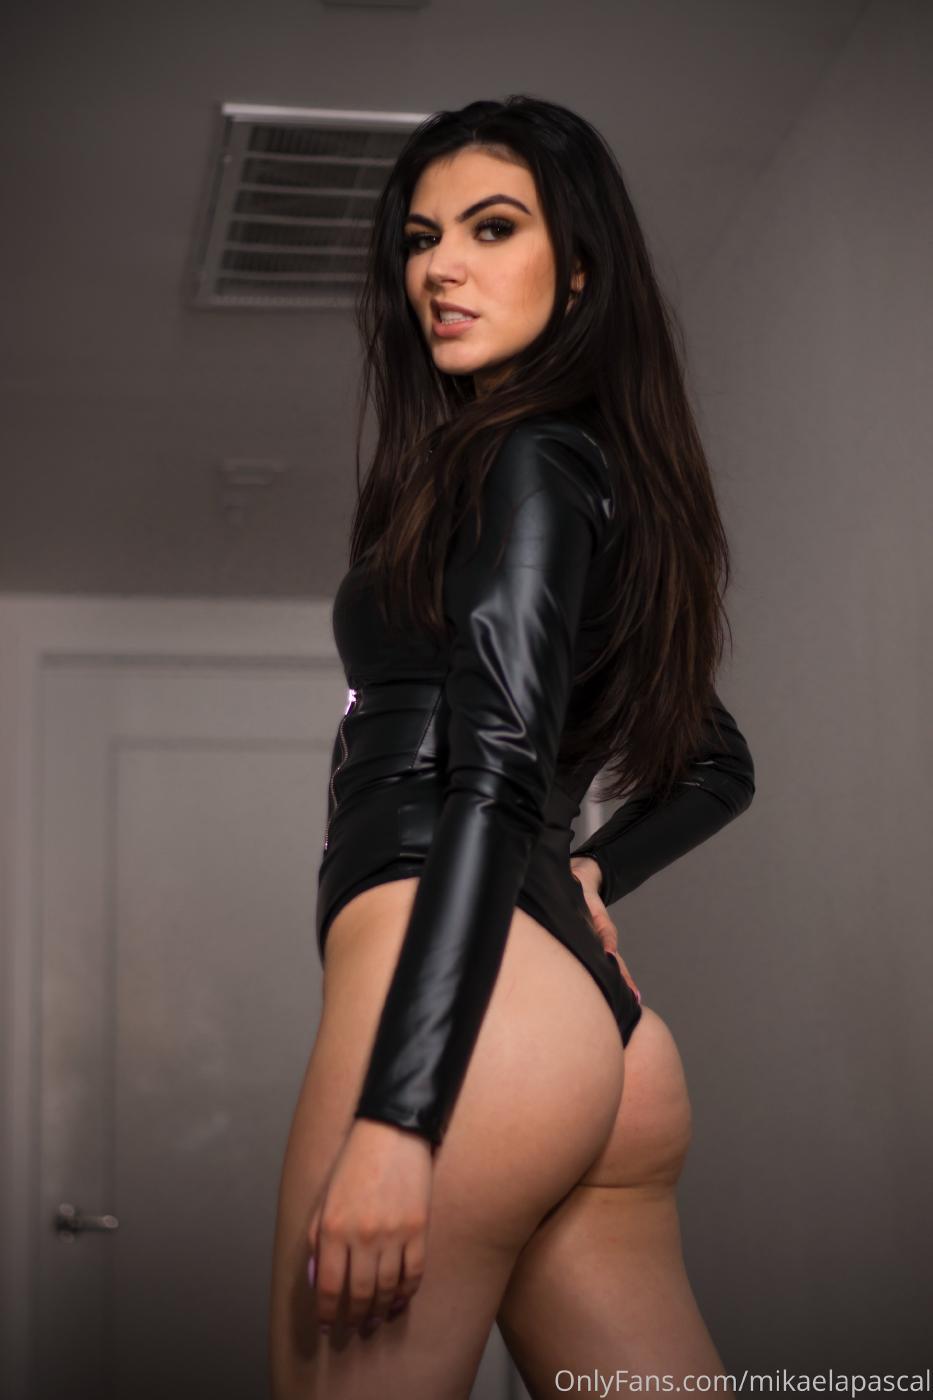 Mikaela Pascal Sexy Leather Bodysuit Onlyfans Set Leaked 0003